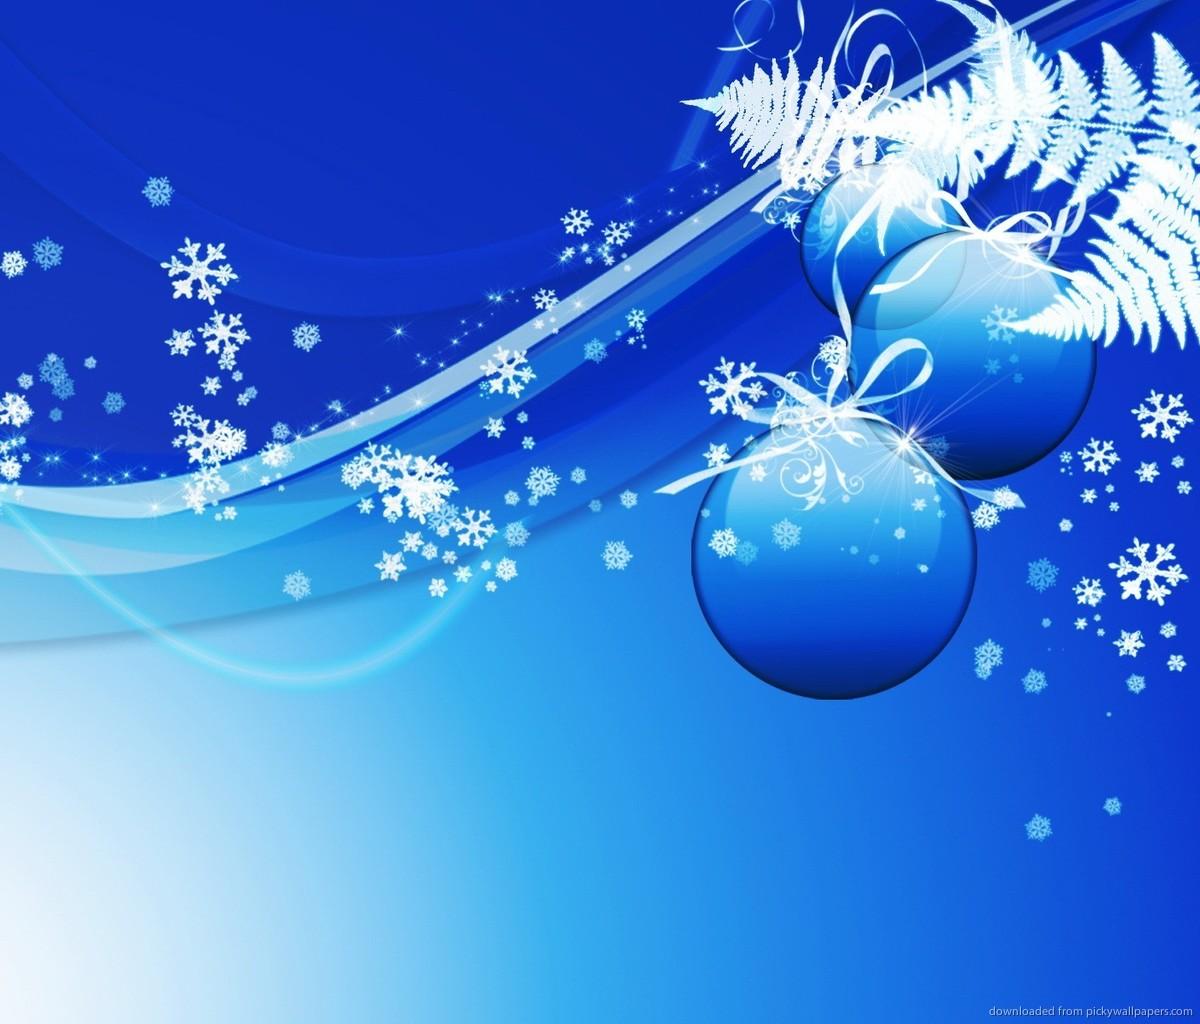 Blue Design Christmas Background Wallpaper For Samsung Galaxy Tab 1200x1024